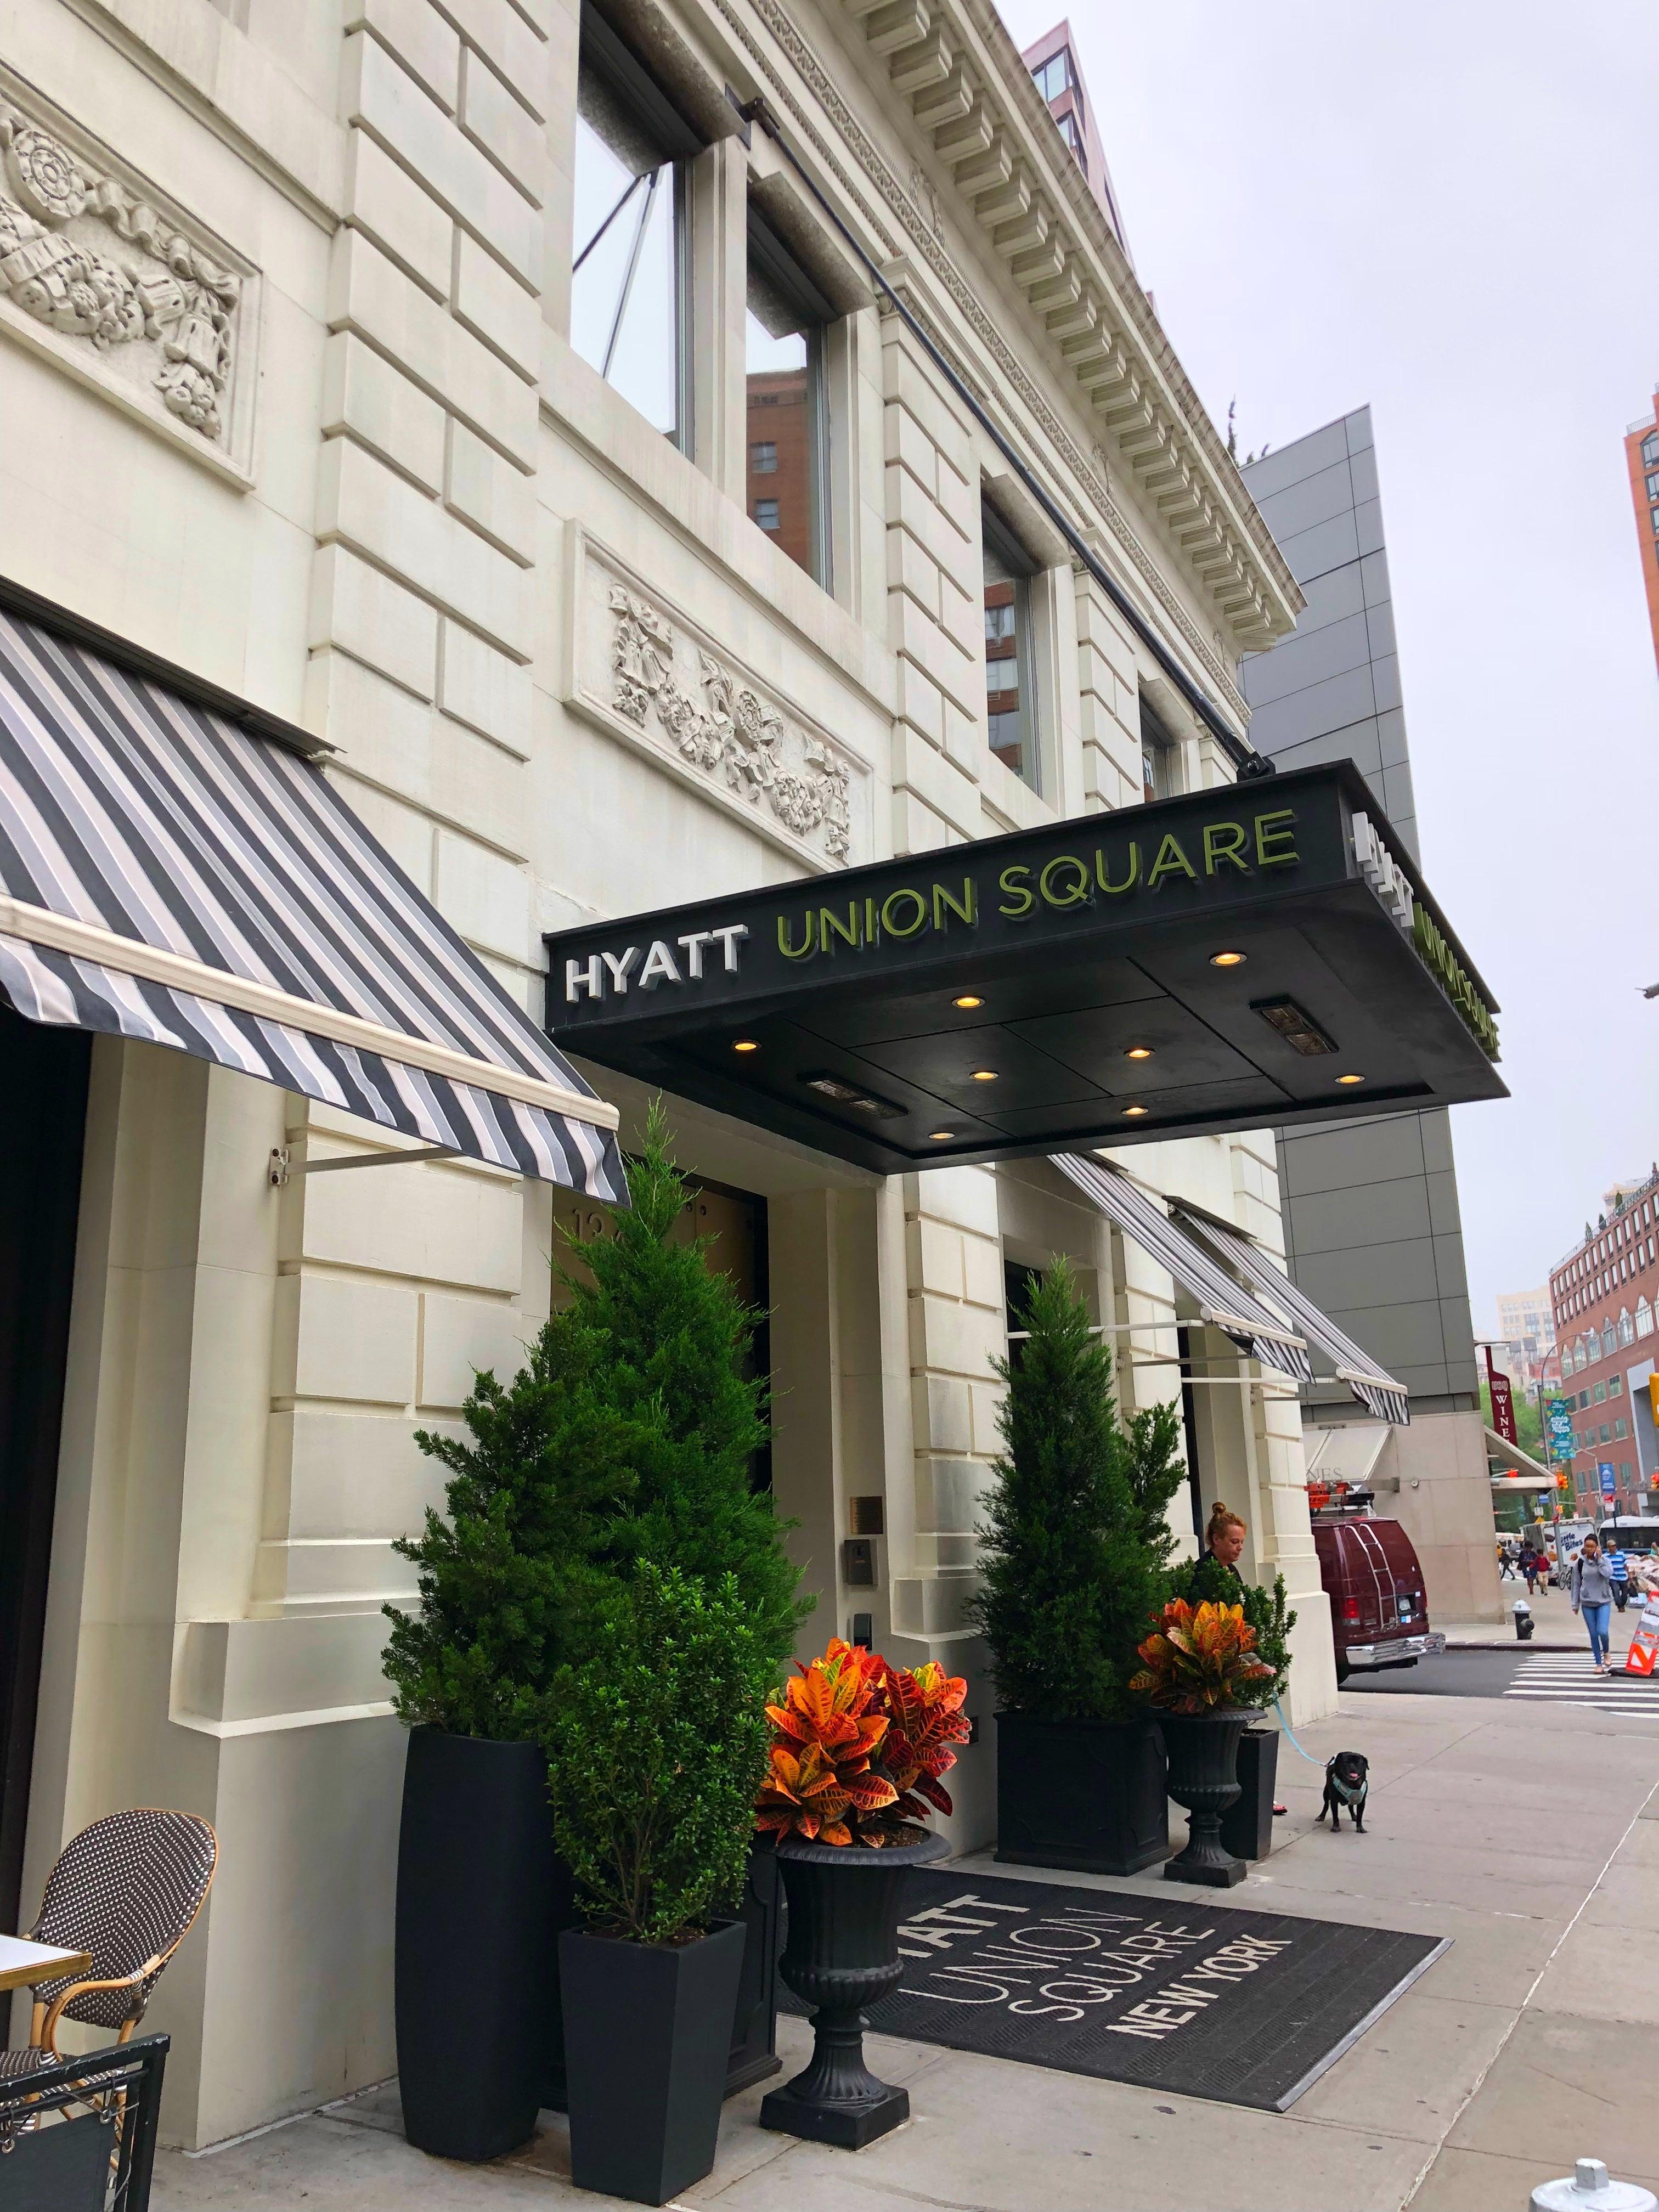 Hyatt Union Square New York Review: Inviting Hotel Below